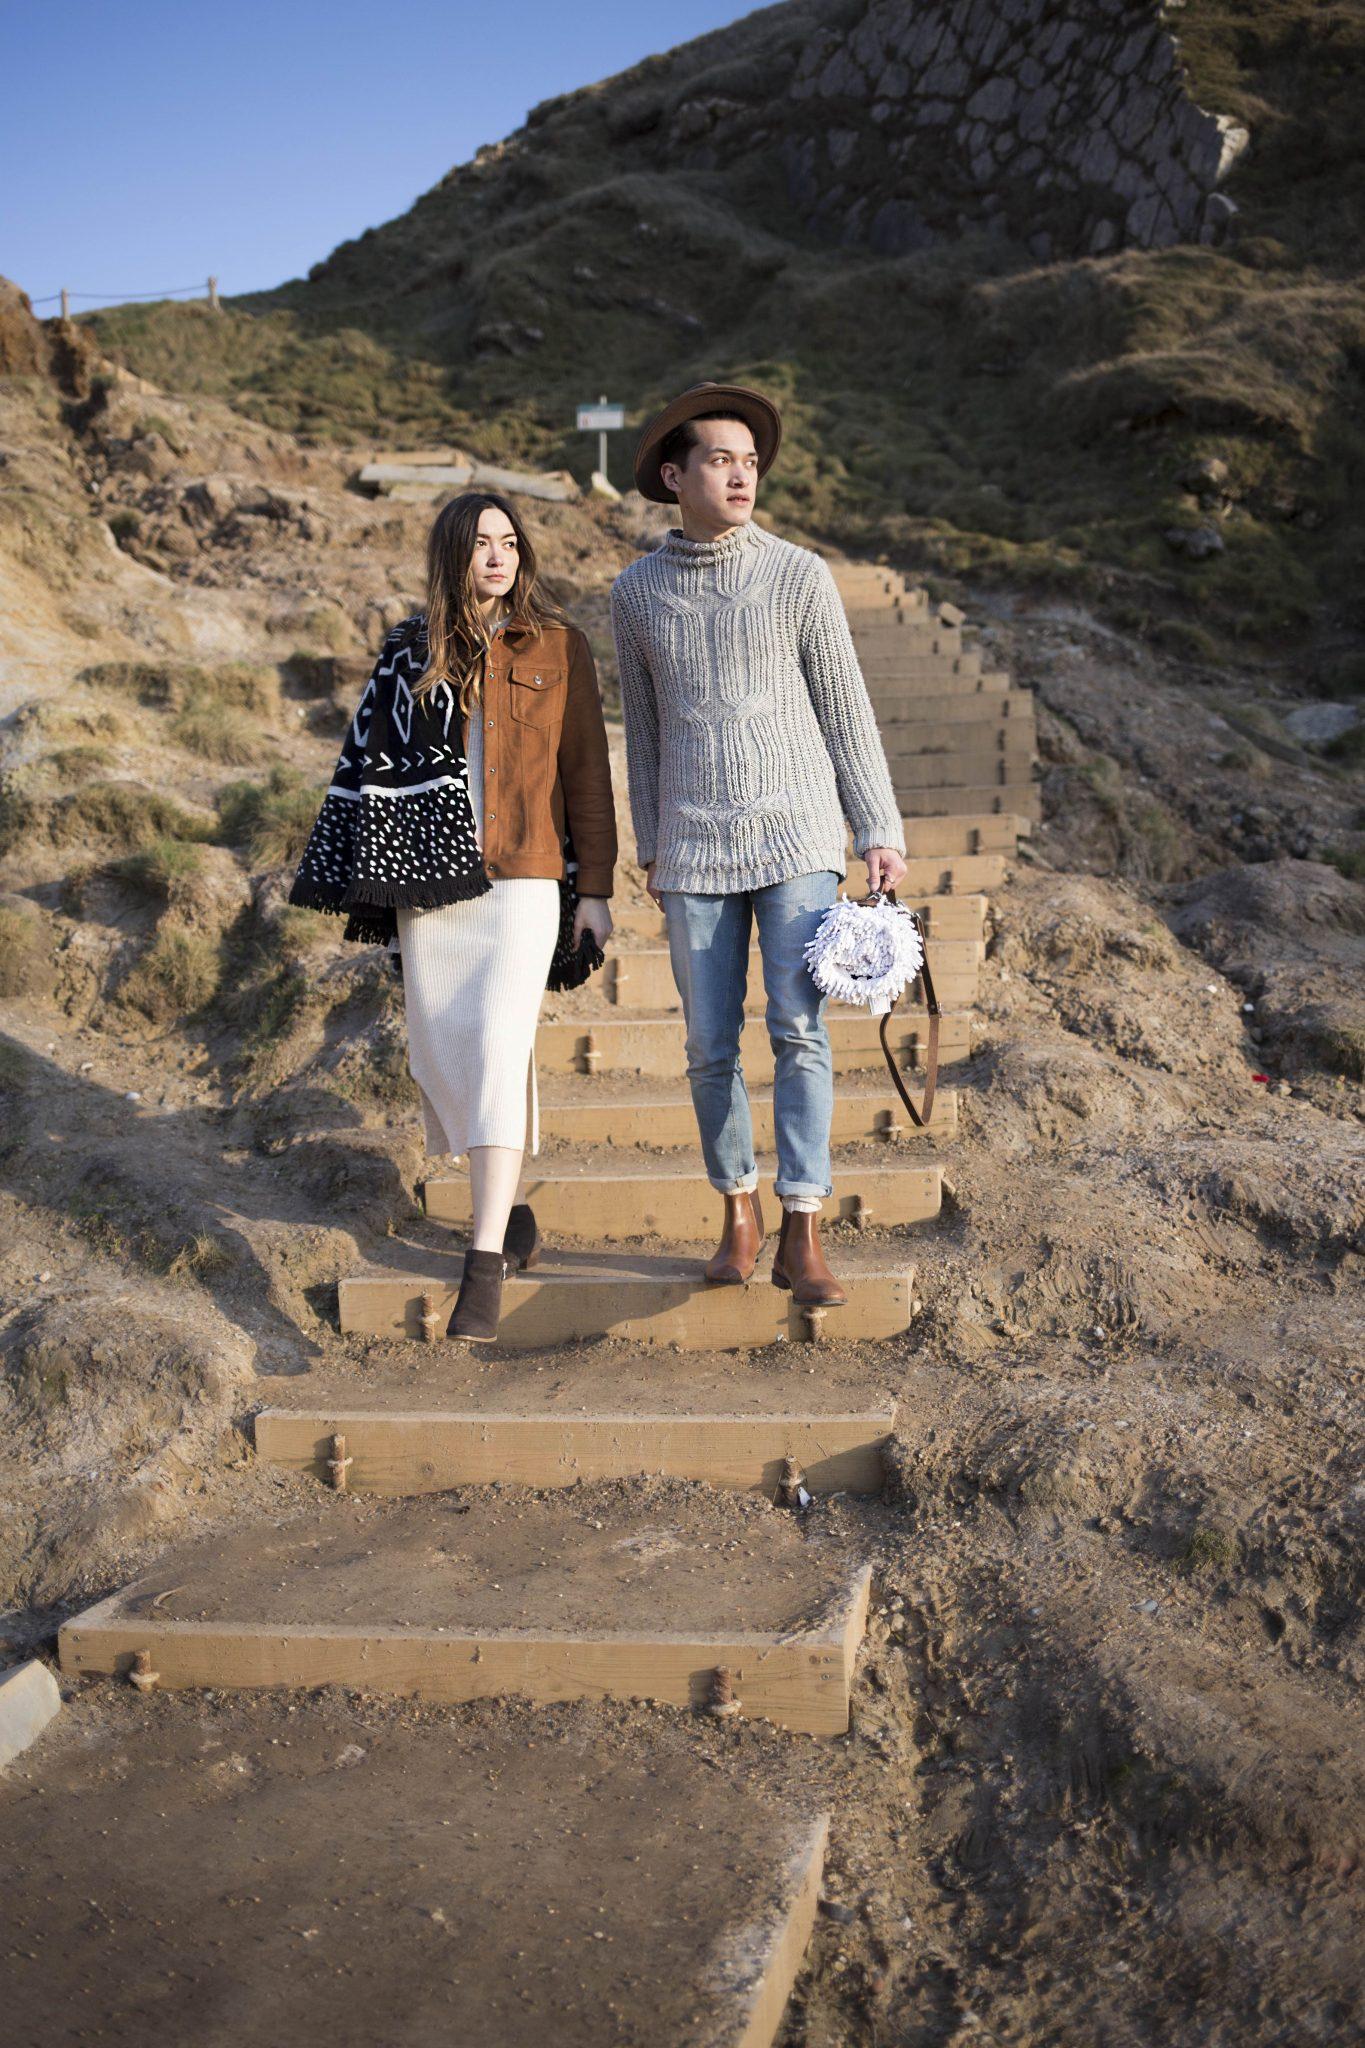 Jordan_Bunker_the_beach_people_1 copy